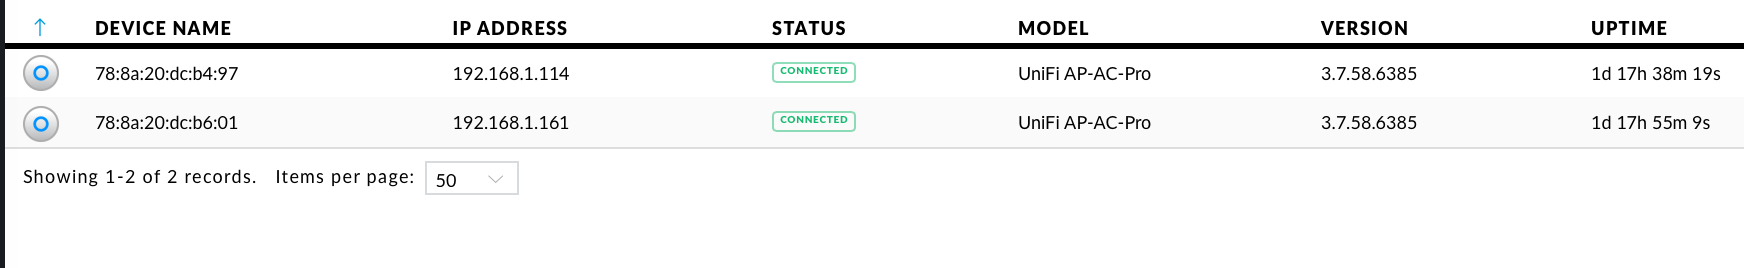 Ubiquiti AC Pro - stuck at Adopting   Ubiquiti Community